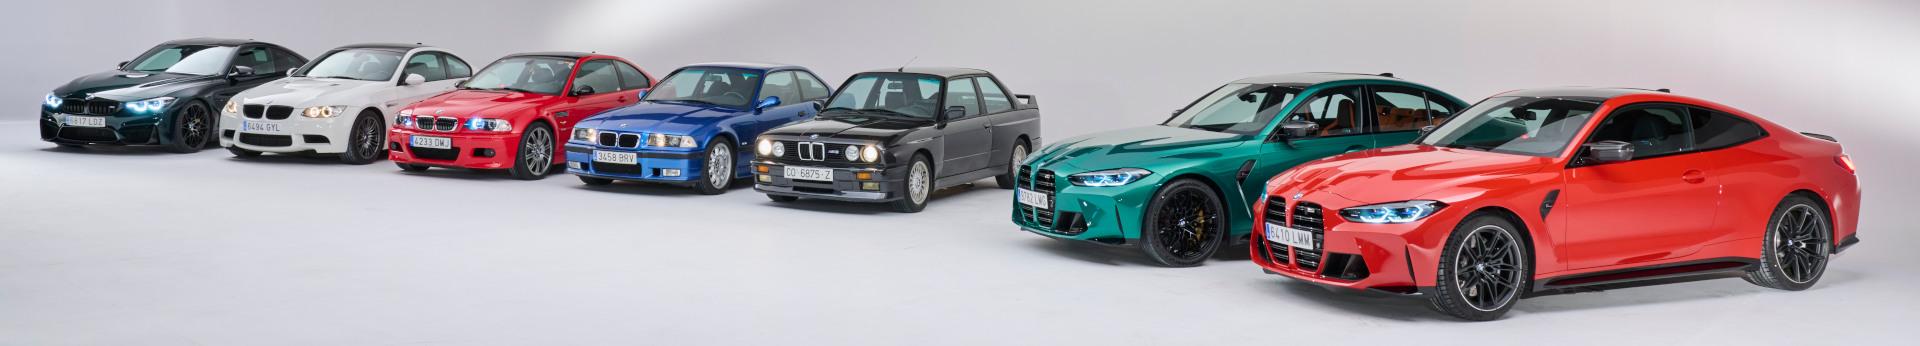 Name:  BMW-M3-M4-F82-E92-E46-E36-E30-G80-G82.jpg Views: 3680 Size:  162.3 KB